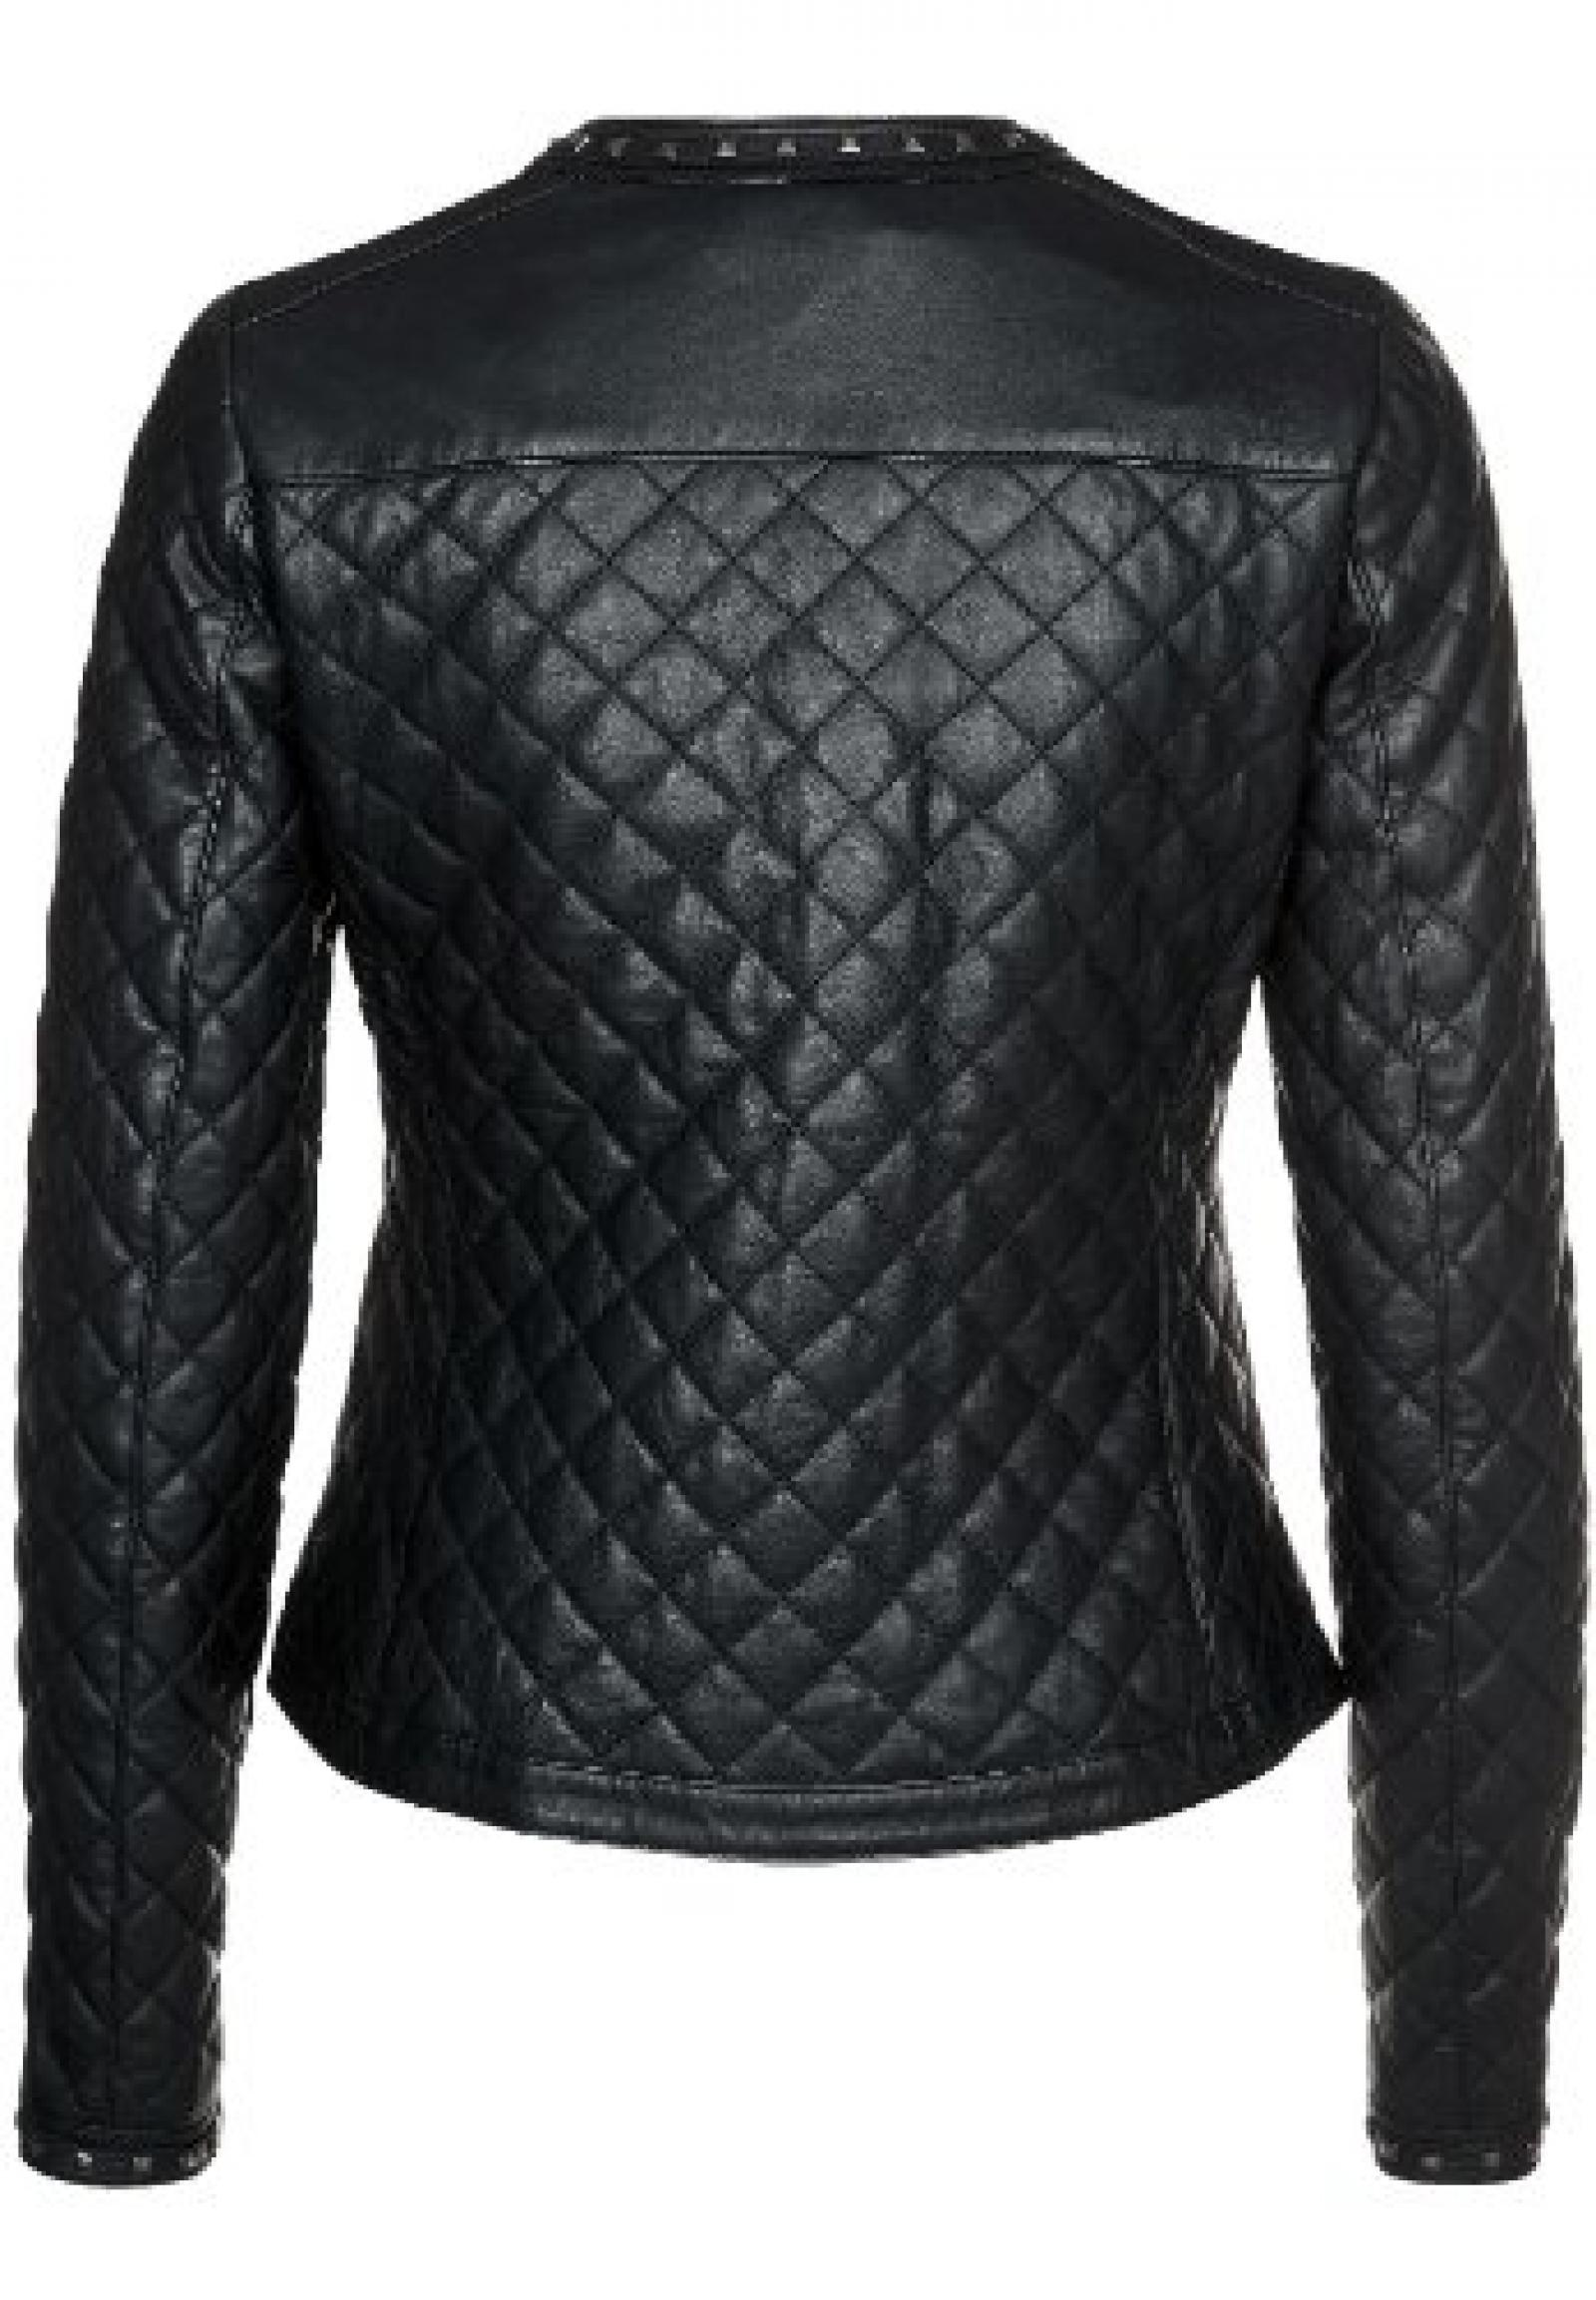 APART Fashion, Lederjacke, schwarz